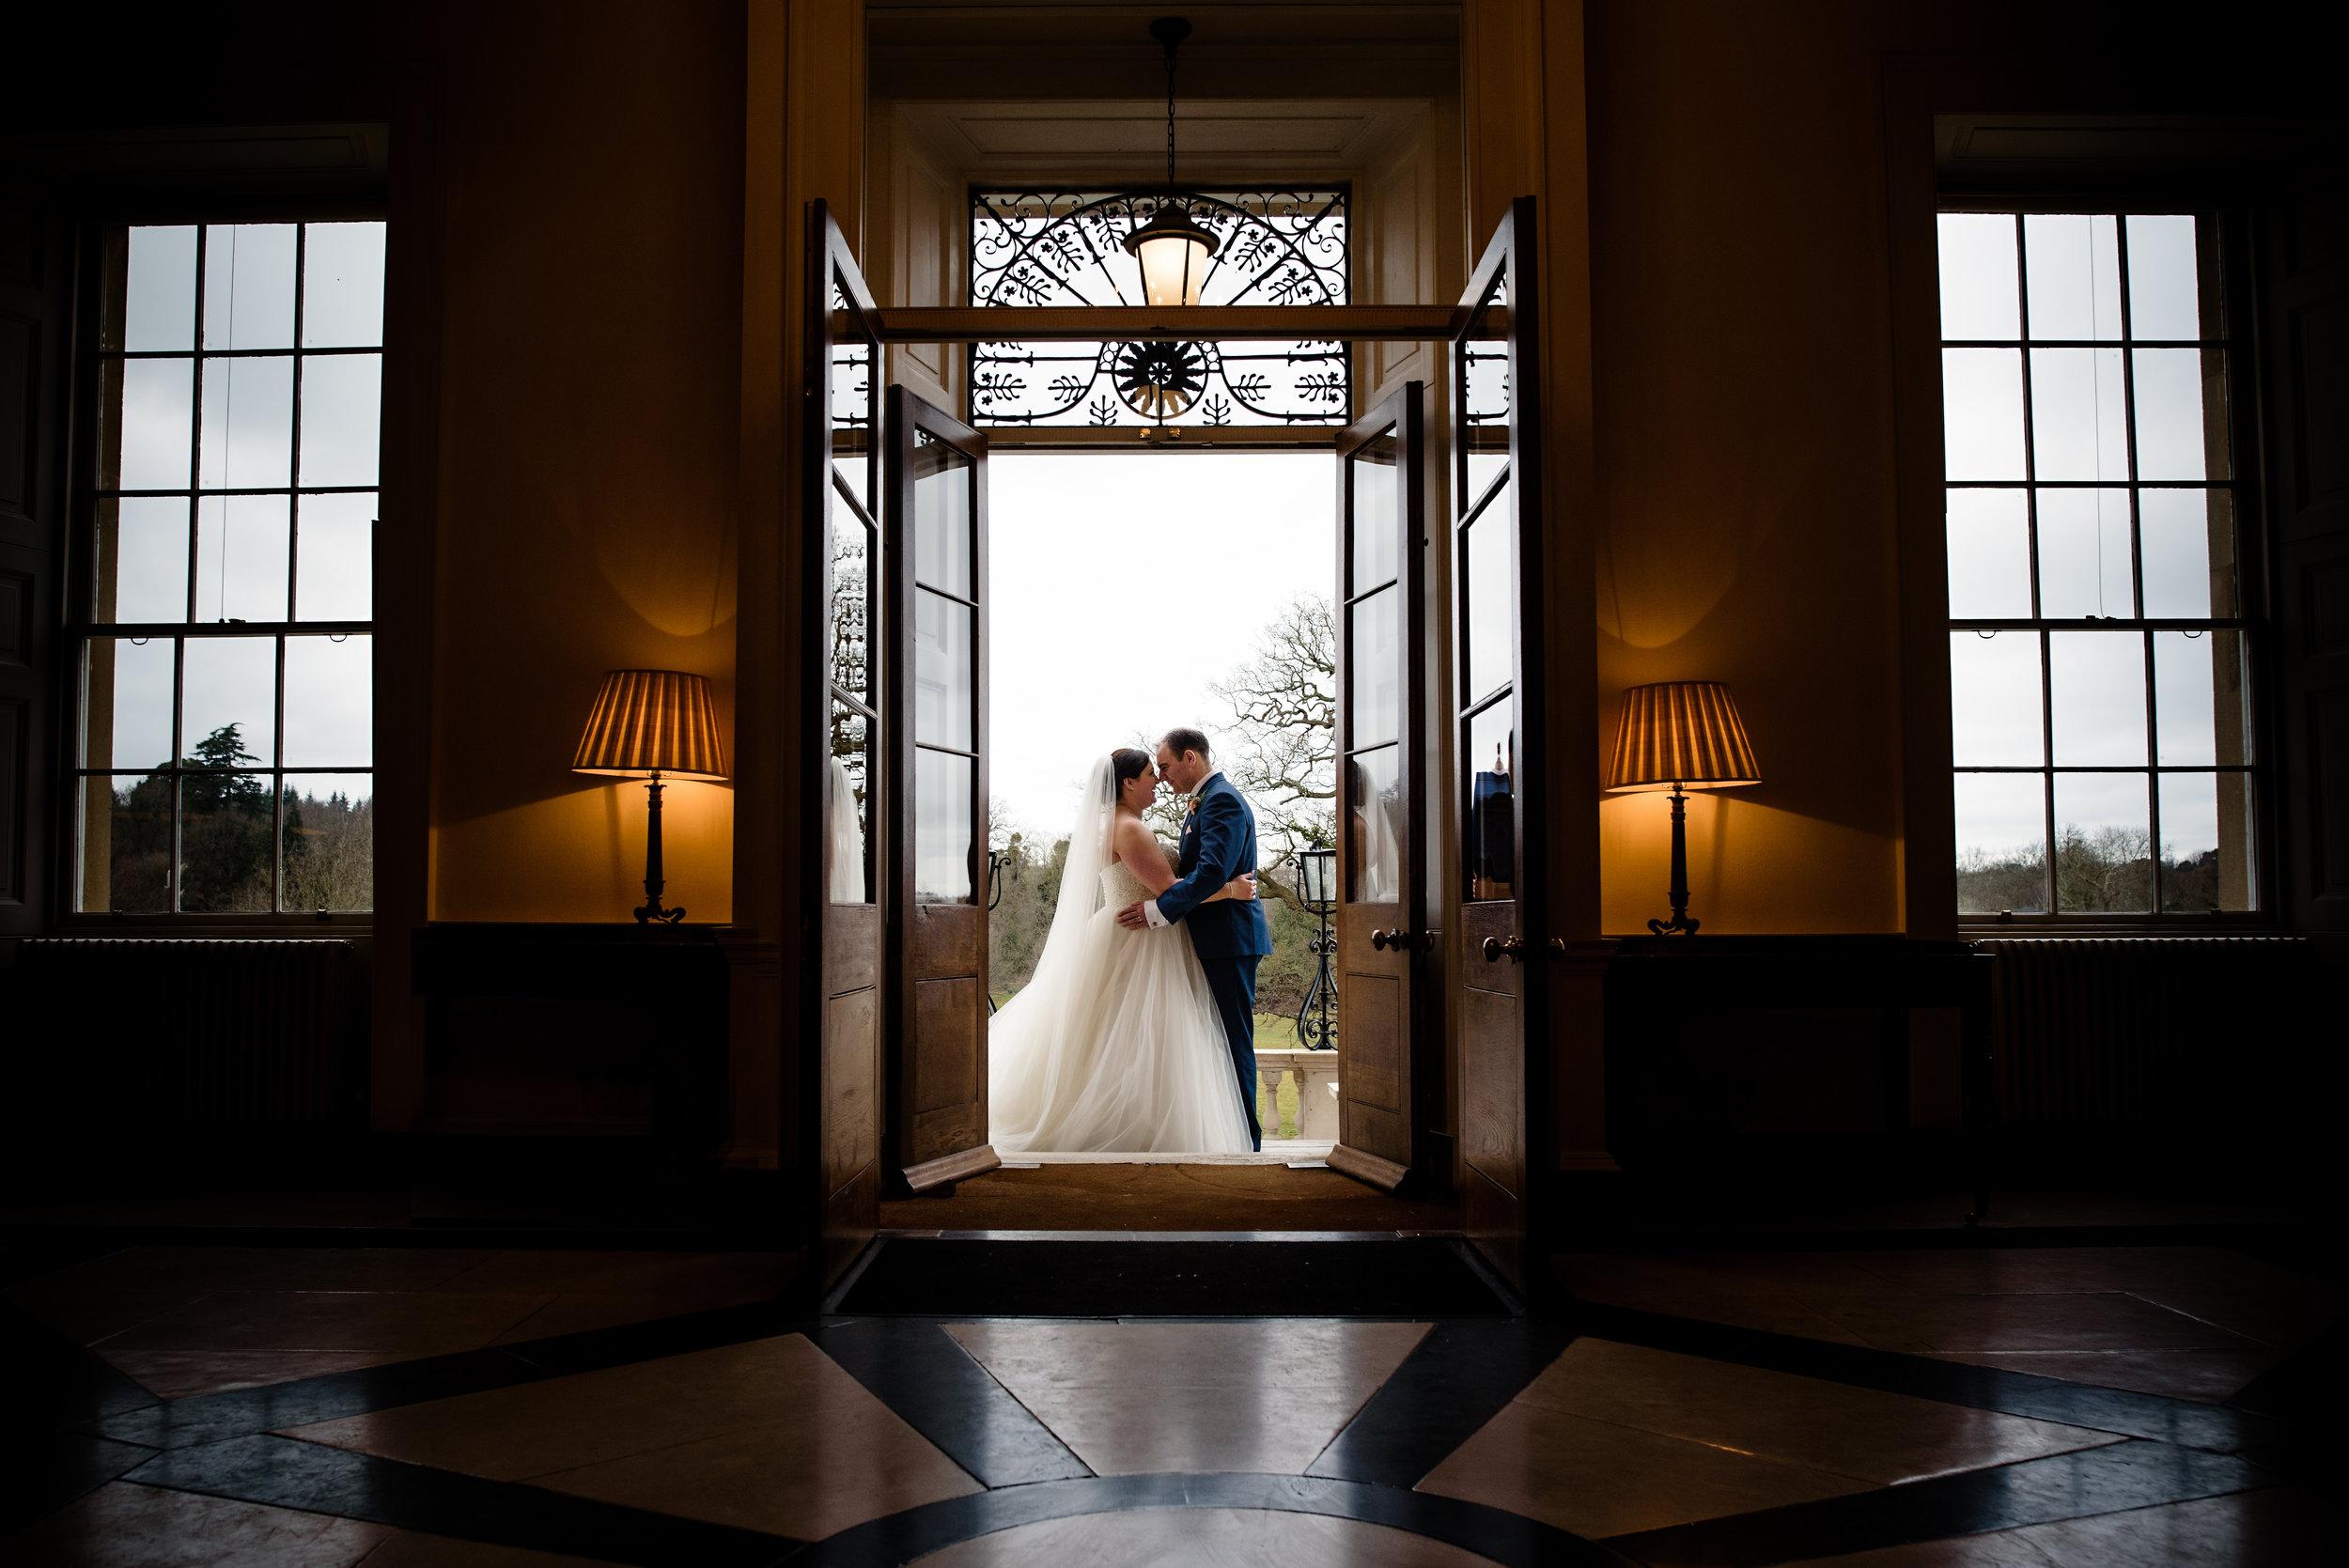 Wedding Gallery - Botley Mansion, Chertsey, Surrey